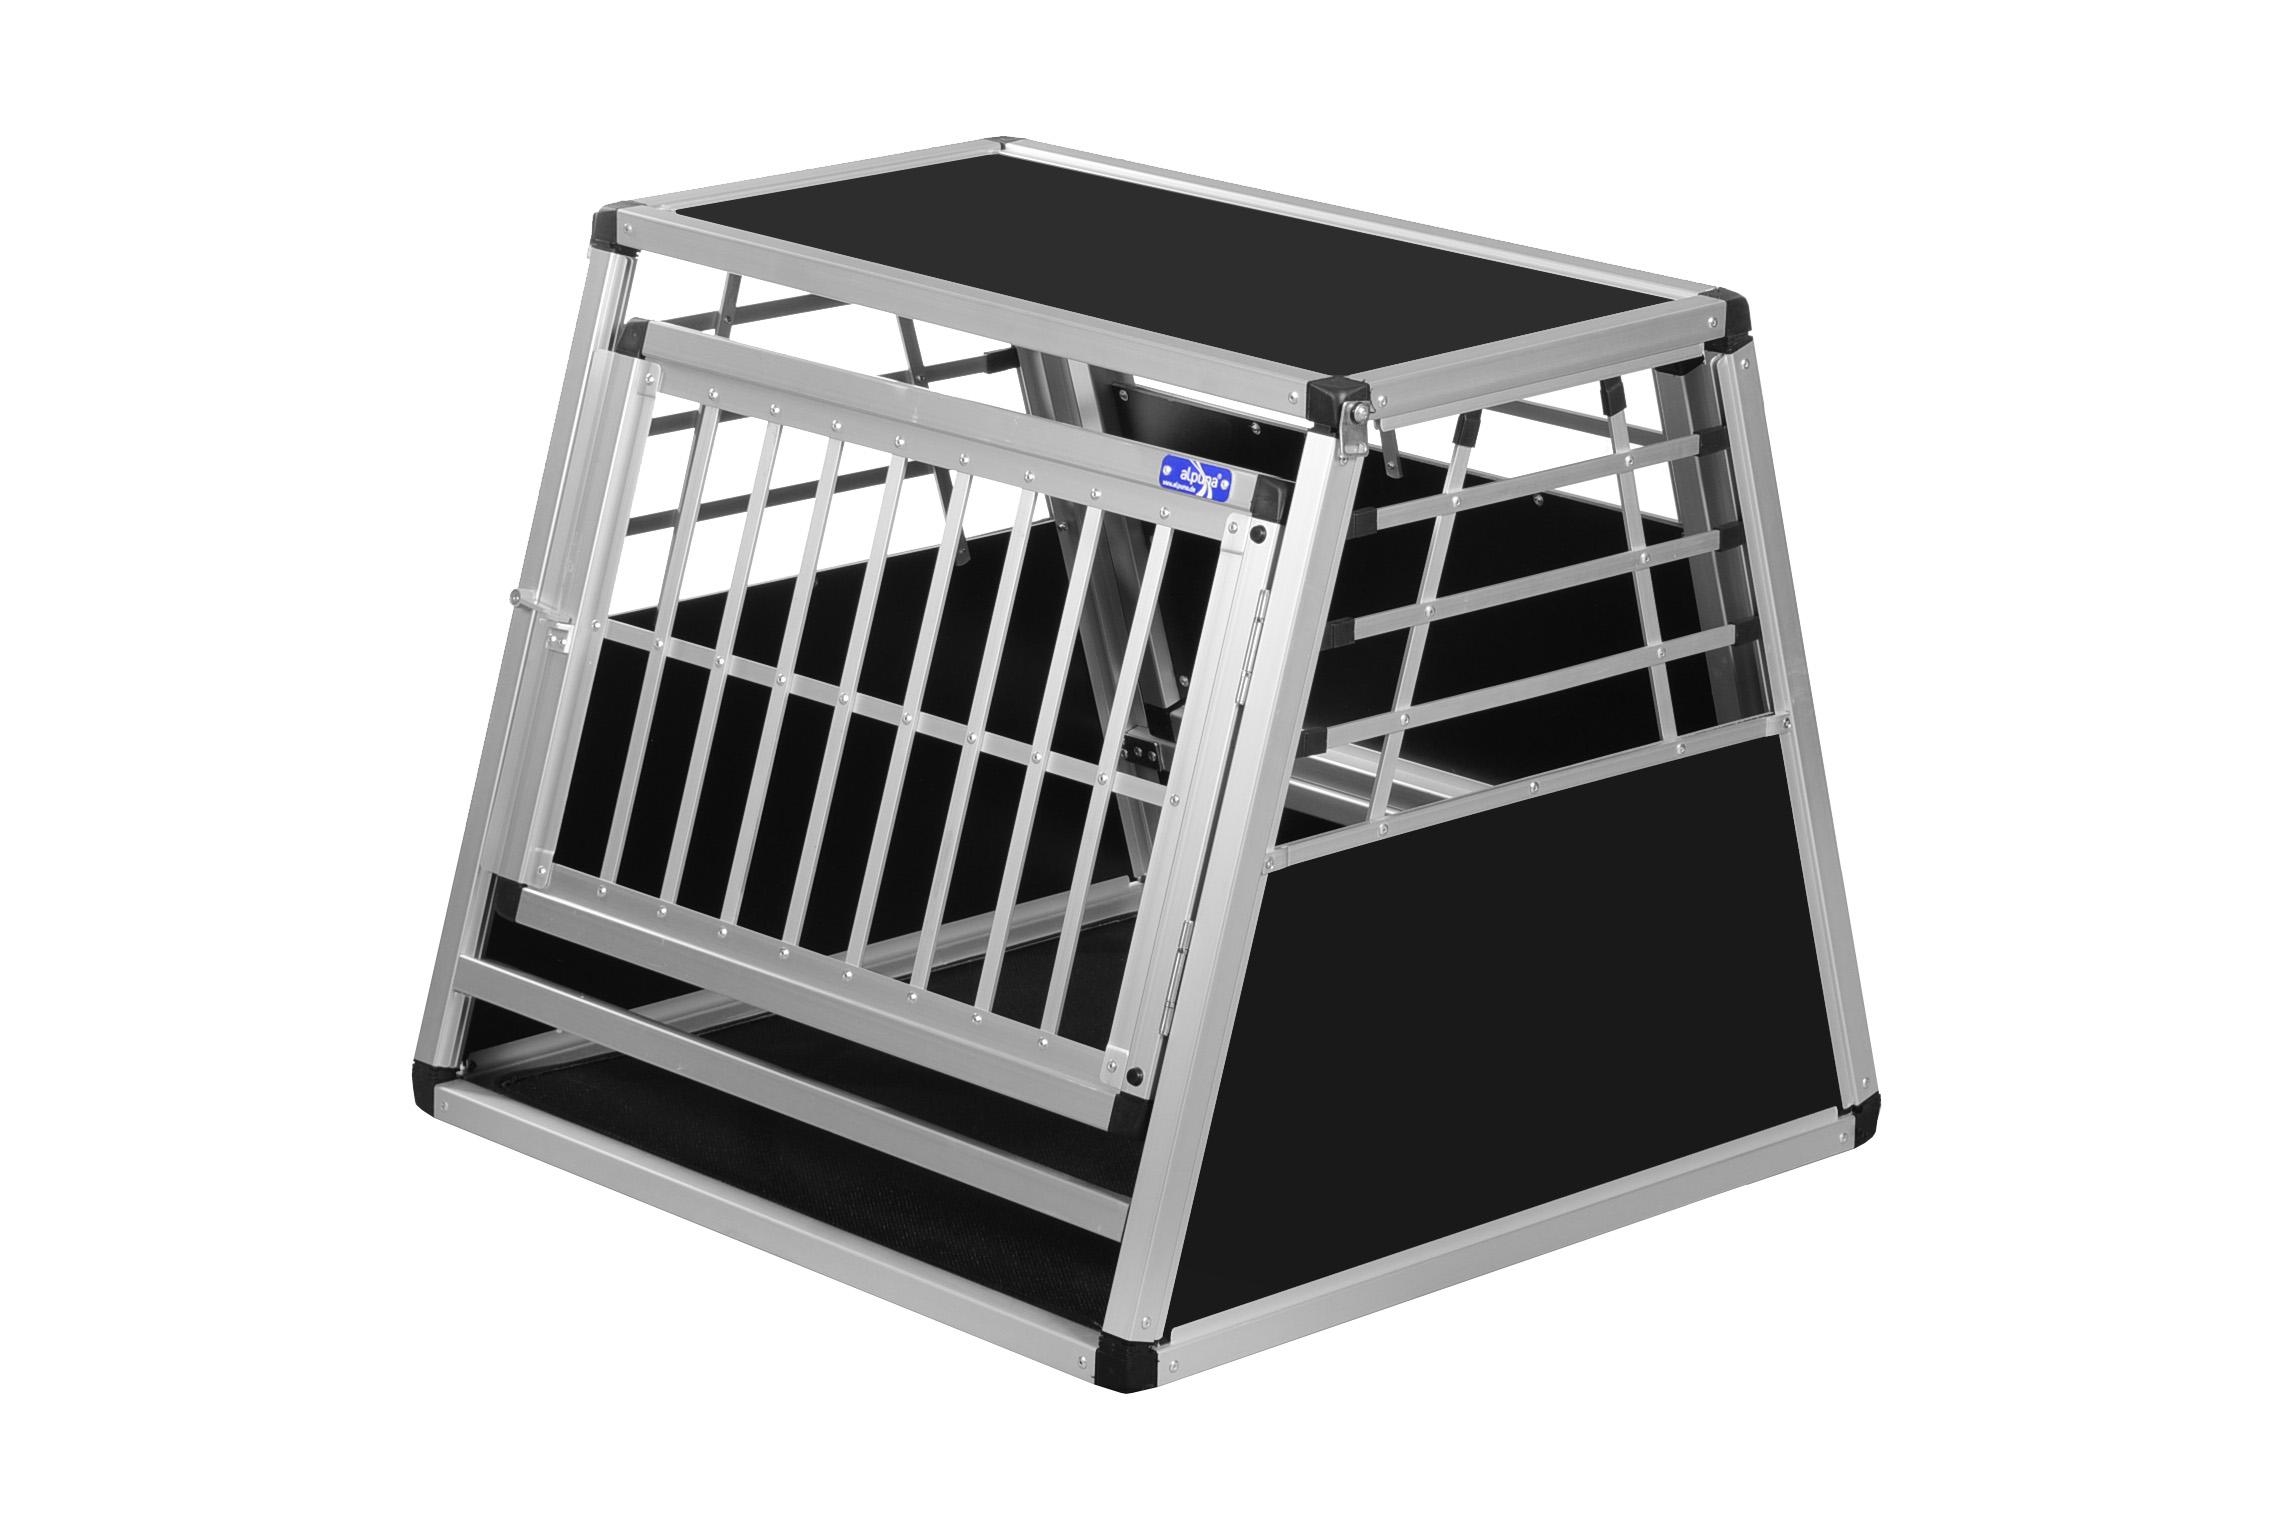 transportbox n19 72x72x62cm notausstieg alu hundeboxen. Black Bedroom Furniture Sets. Home Design Ideas